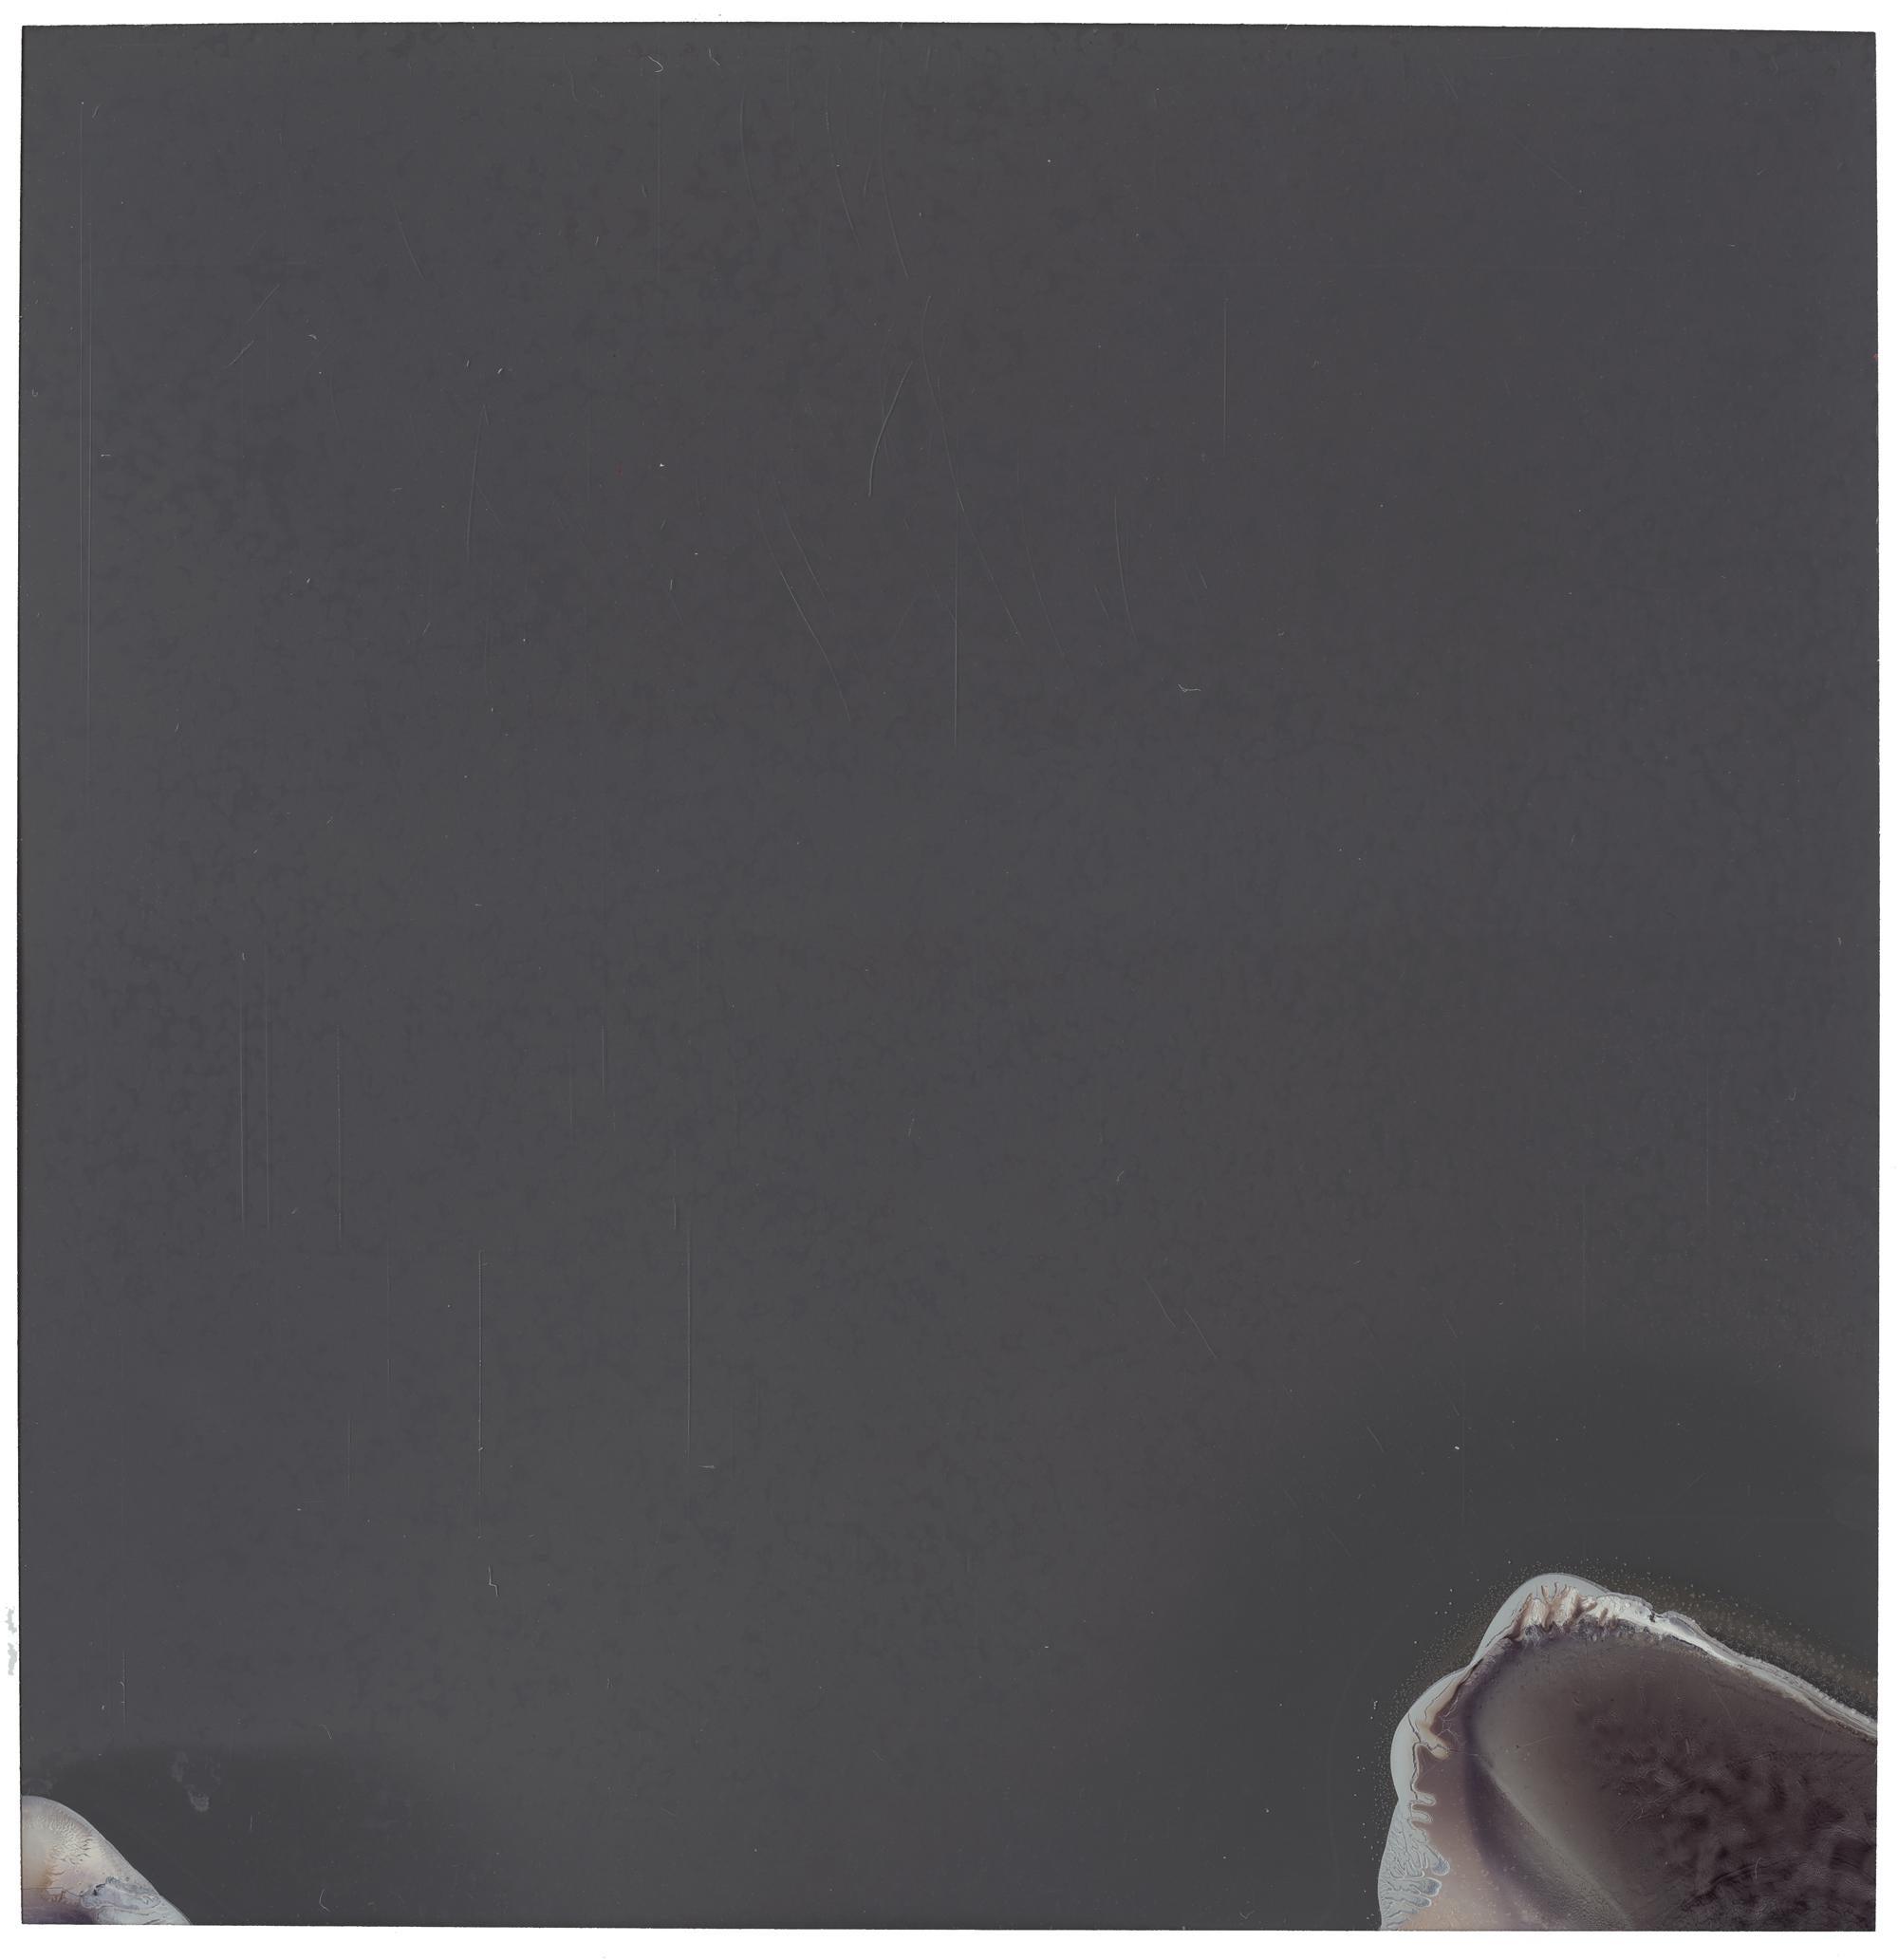 Eternity (Deconstructivism) - Contemporary, Expired Polaroid